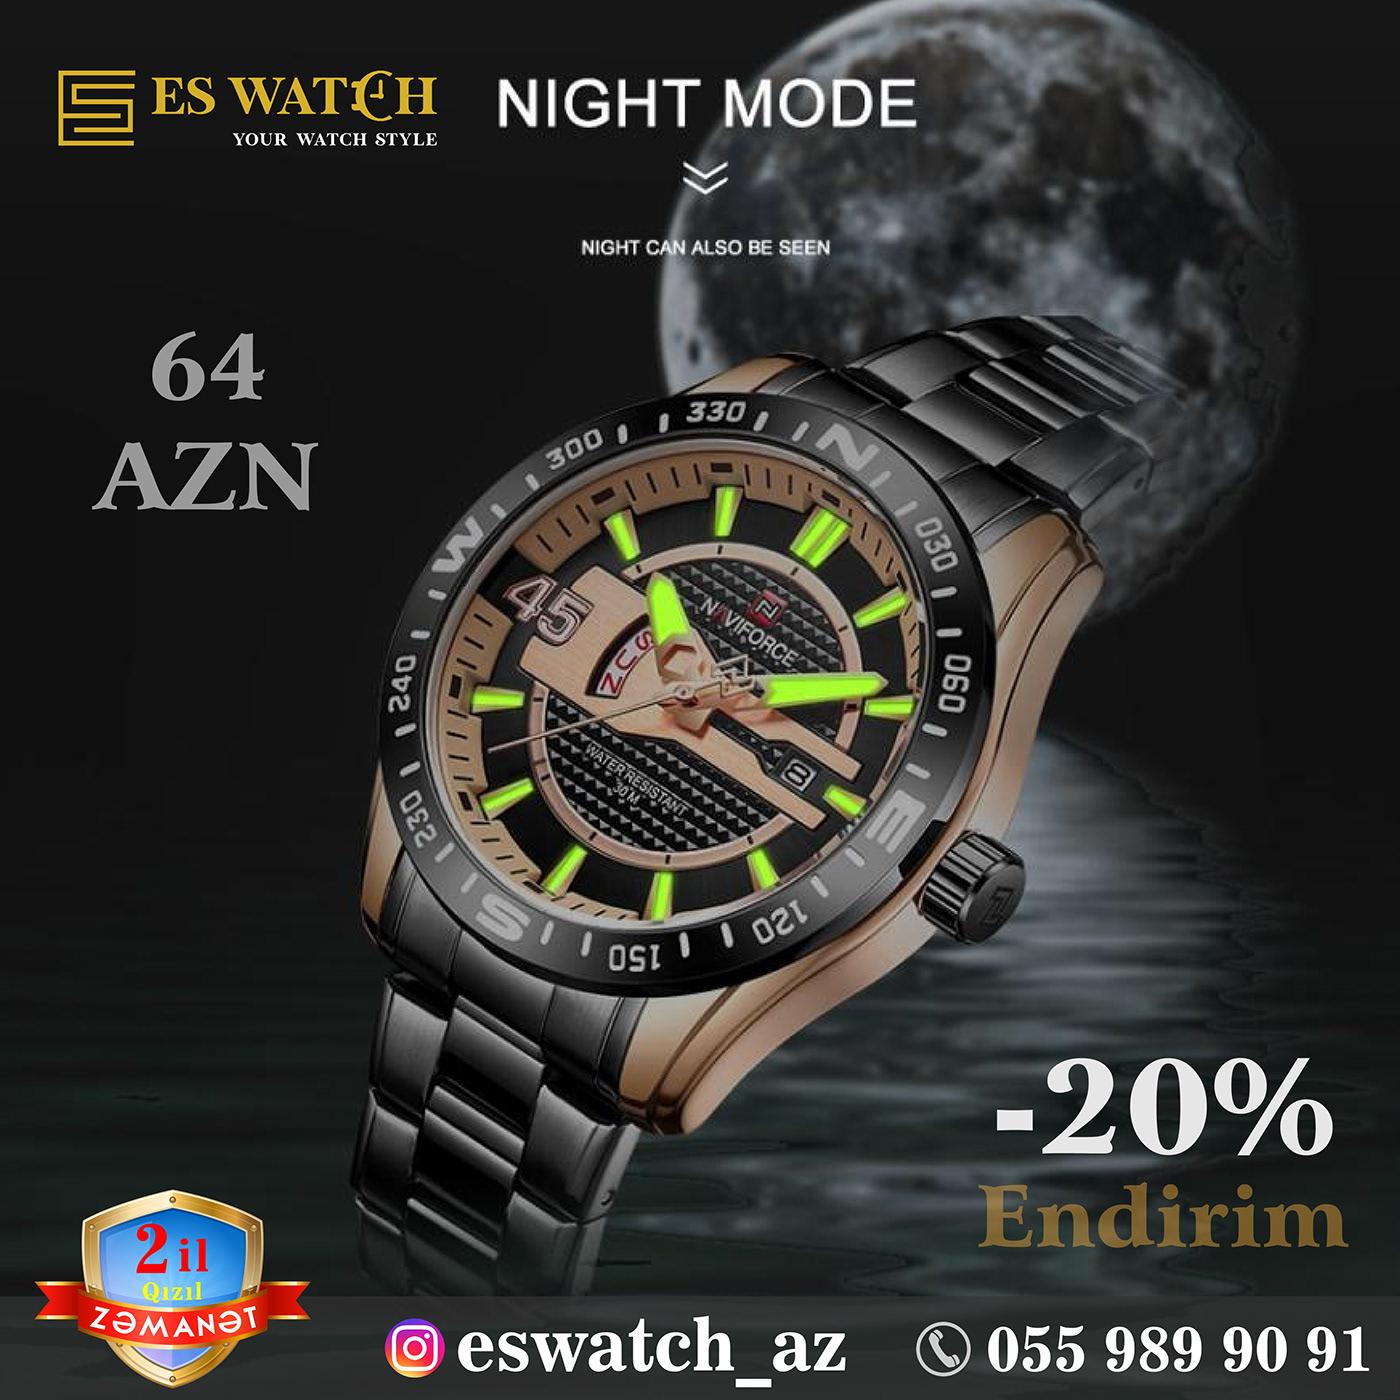 Image may contain: watch, screenshot and clock